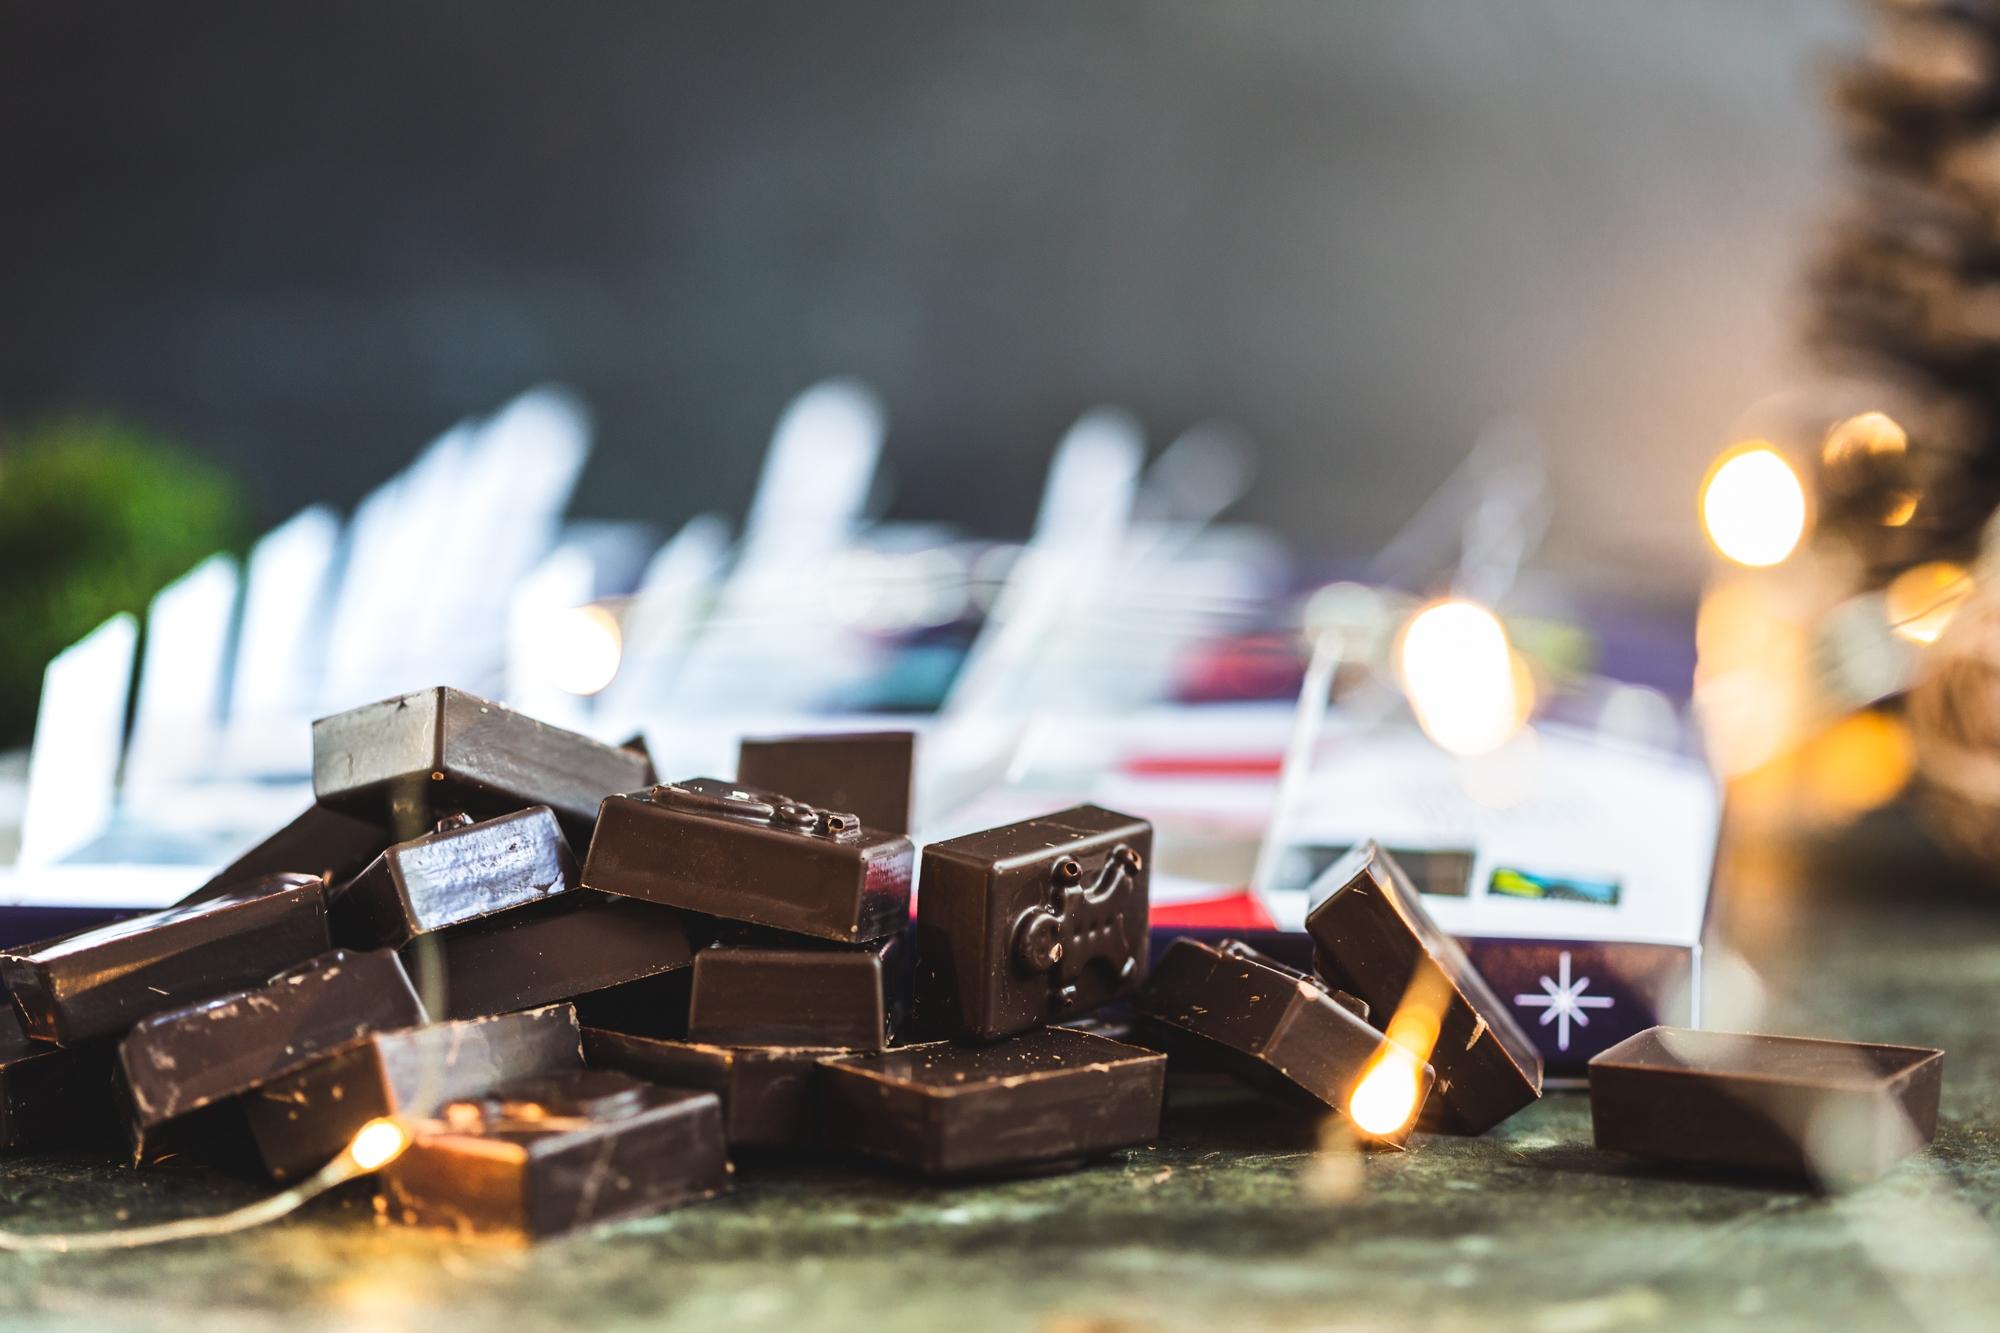 Dark chocolate advent calendar